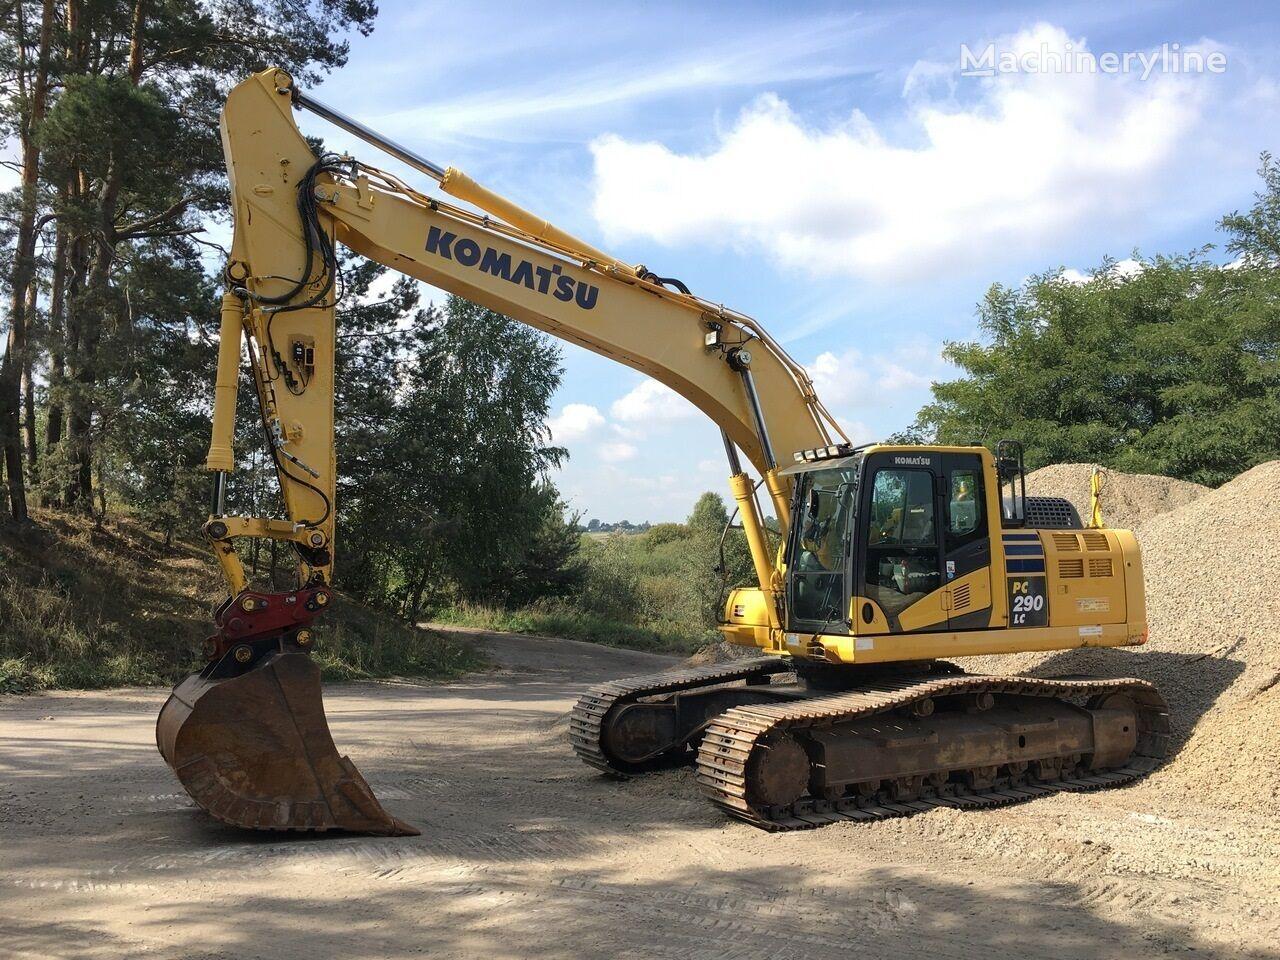 KOMATSU PC290 LC-10 tracked excavator